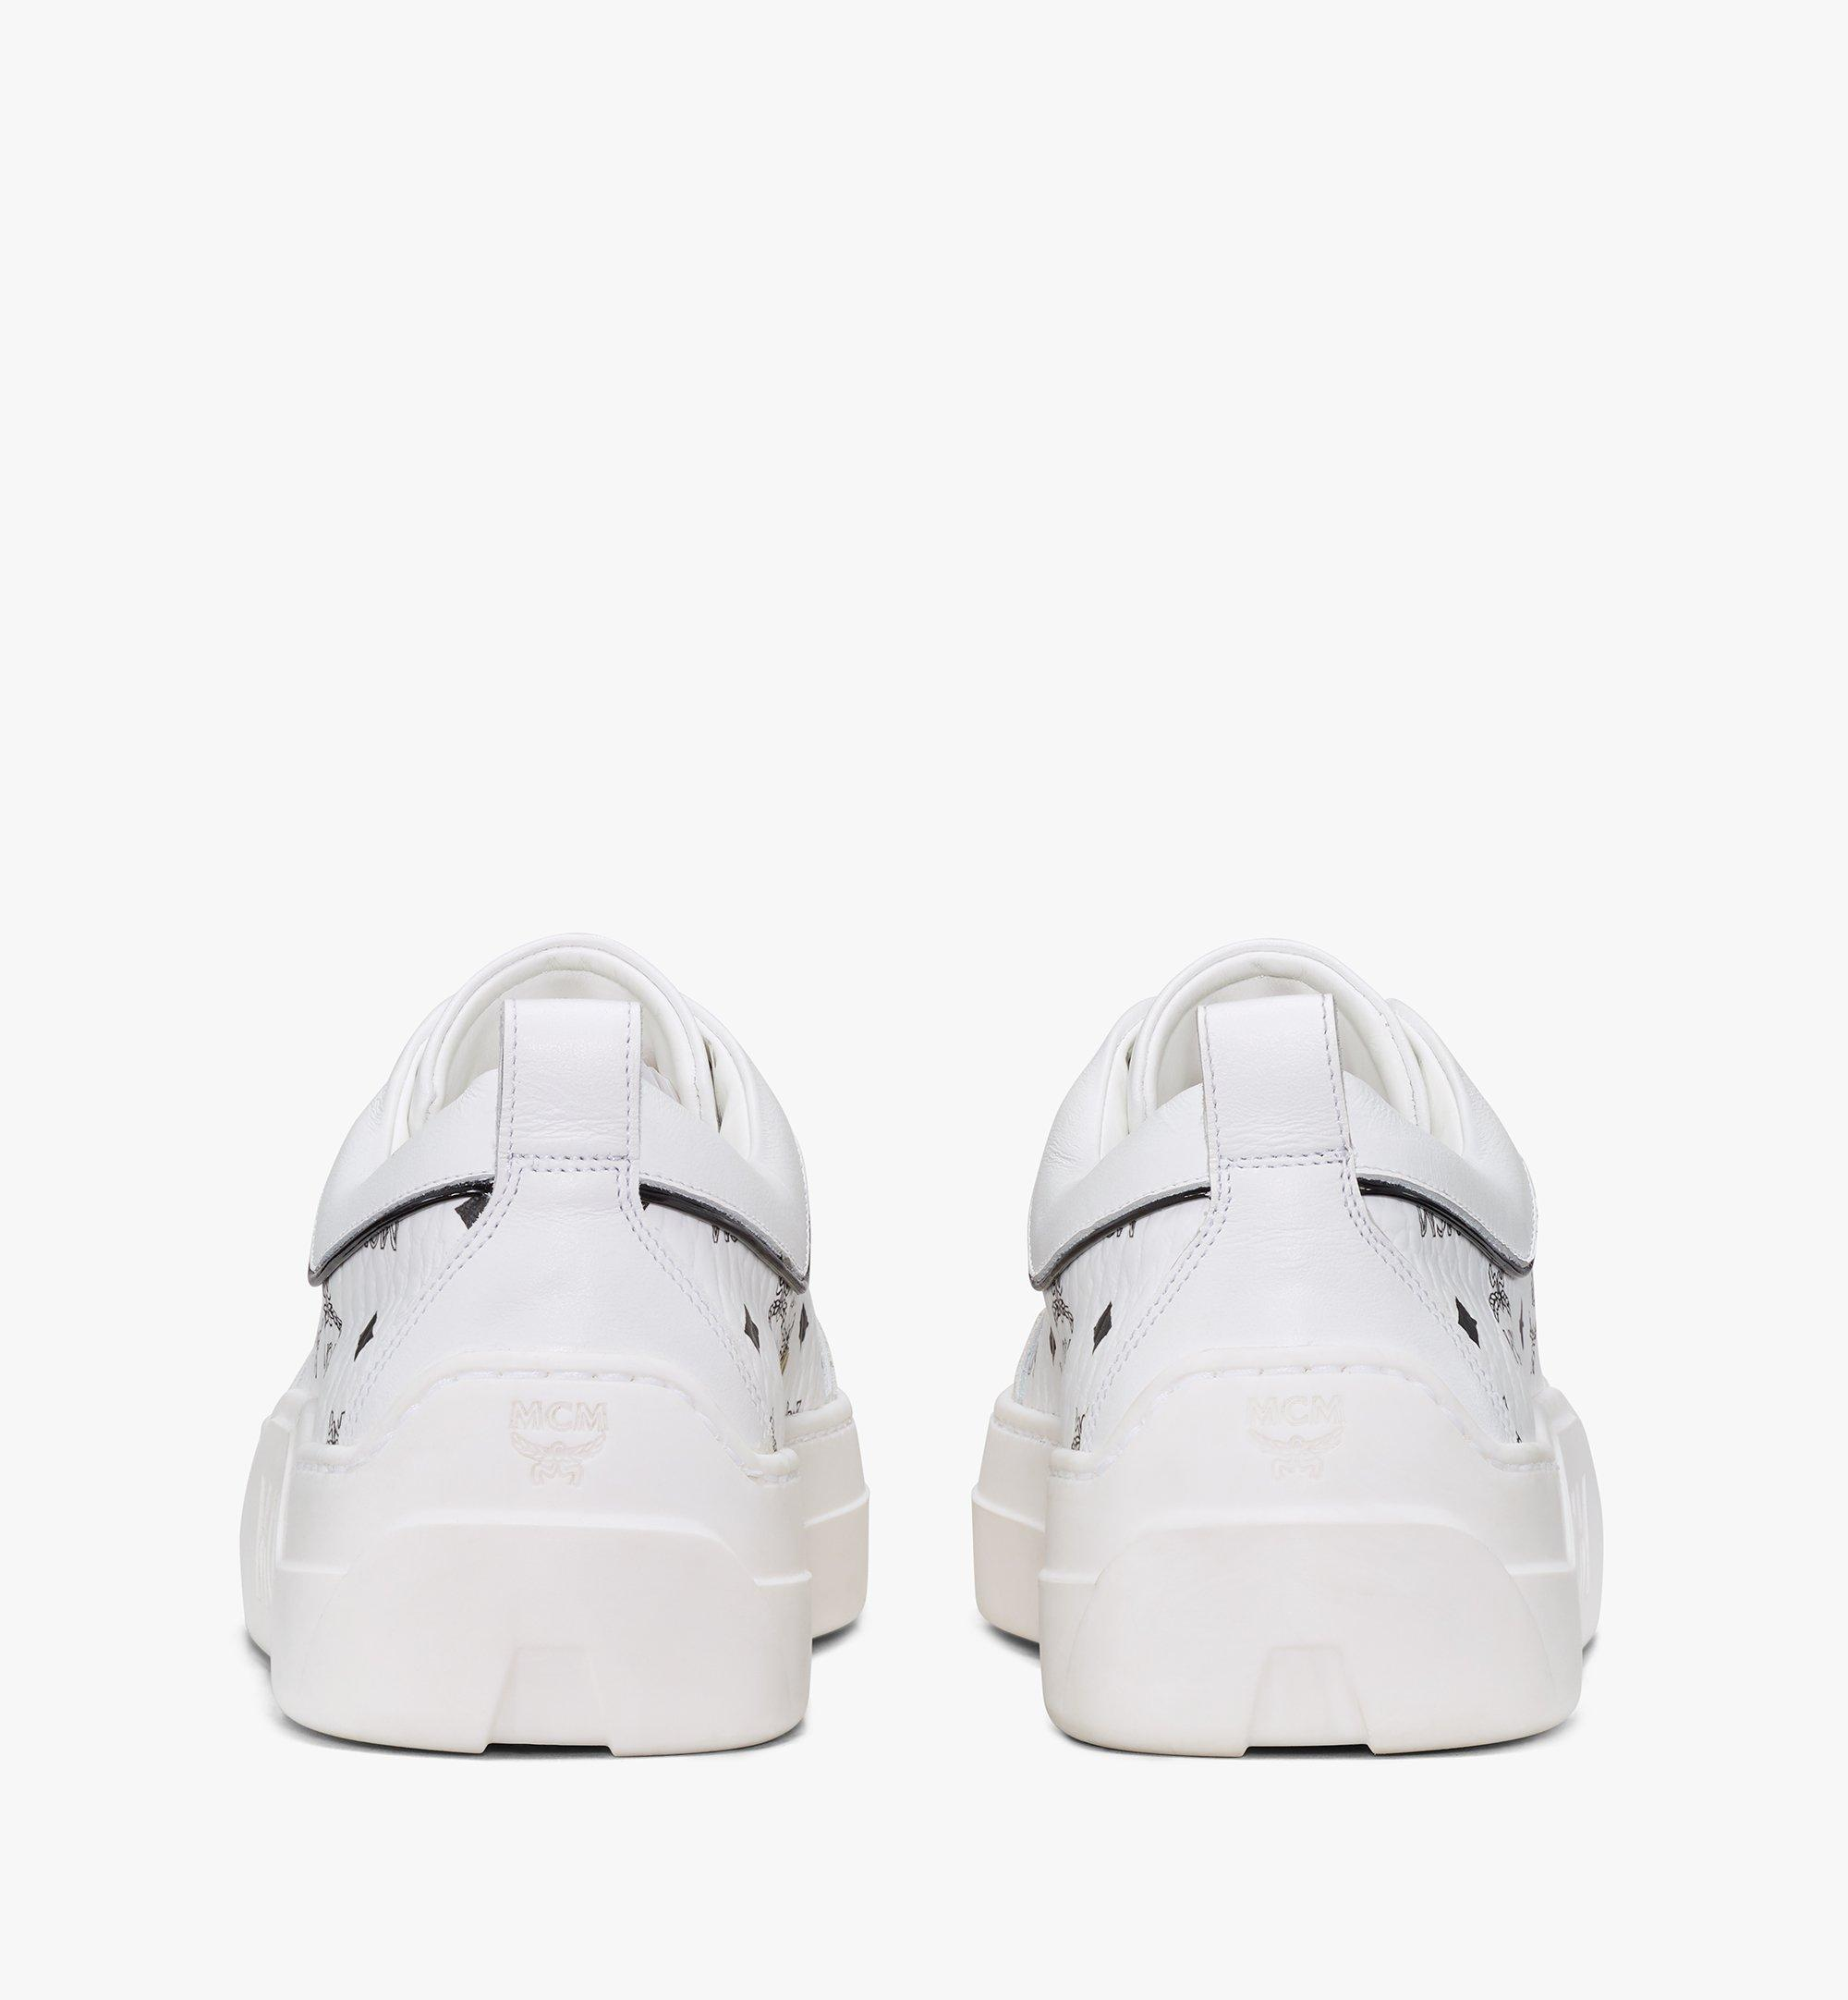 MCM Women's Skyward Platform Sneakers in Visetos White MESAAMM19WT038 Alternate View 2